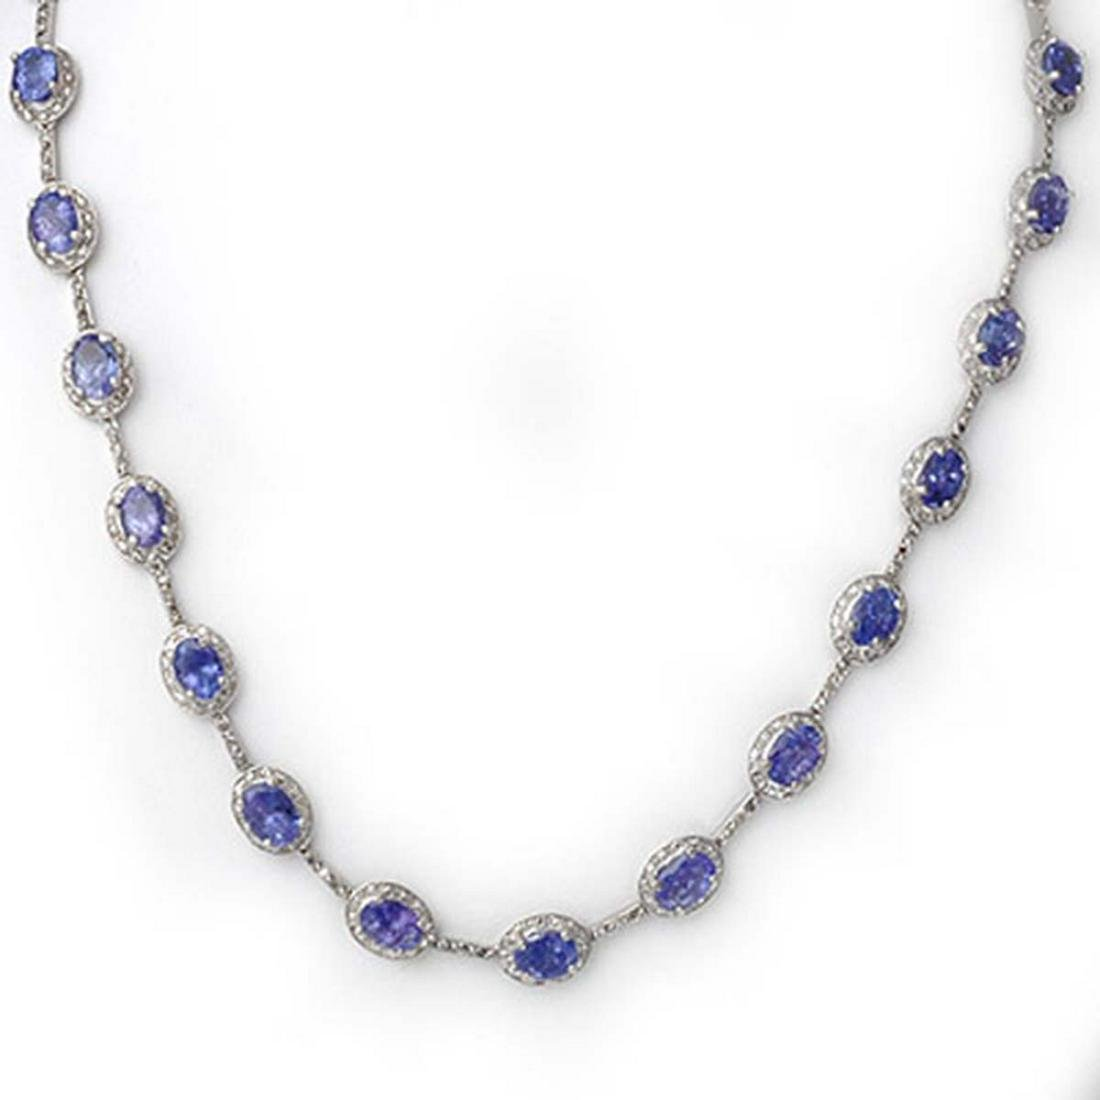 25.0 ctw Tanzanite & Diamond Necklace 10K White Gold